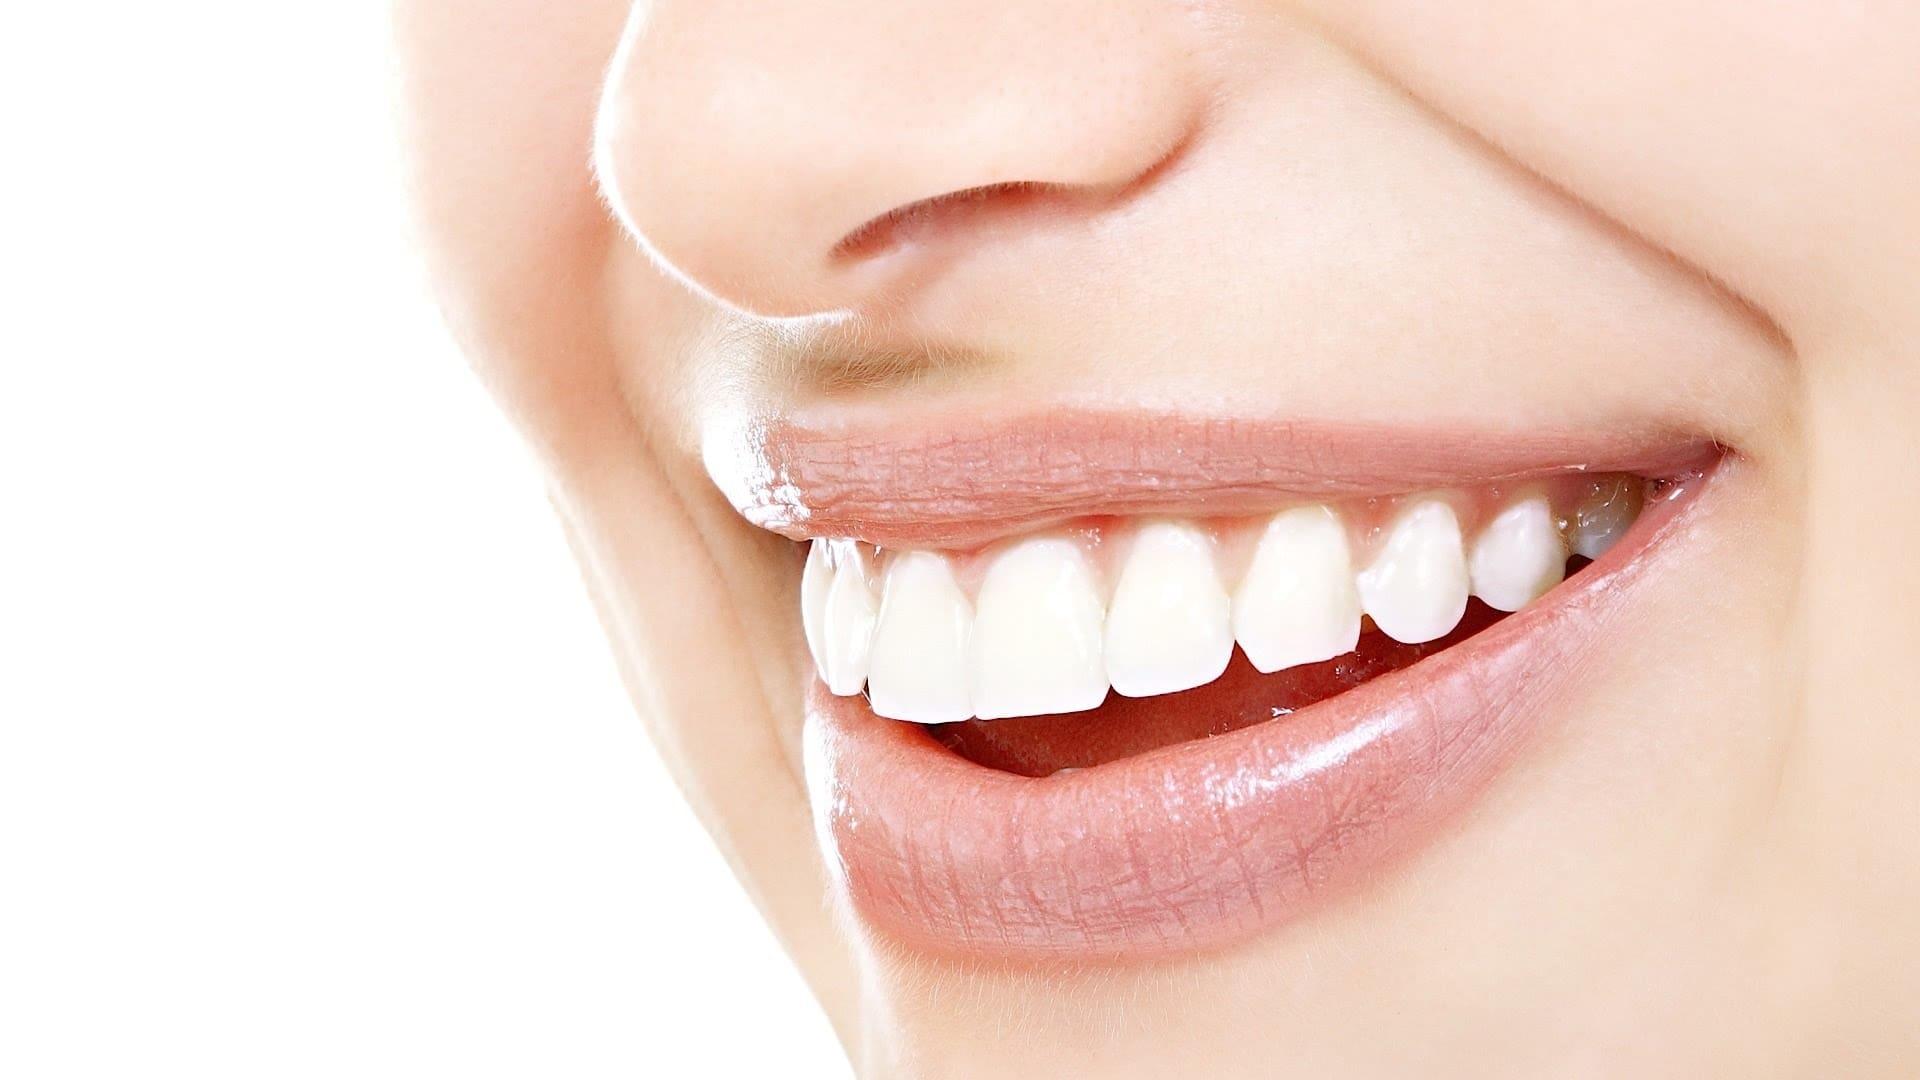 teeth dream meaning, dream about teeth, teeth dream interpretation, seeing in a dream teeth